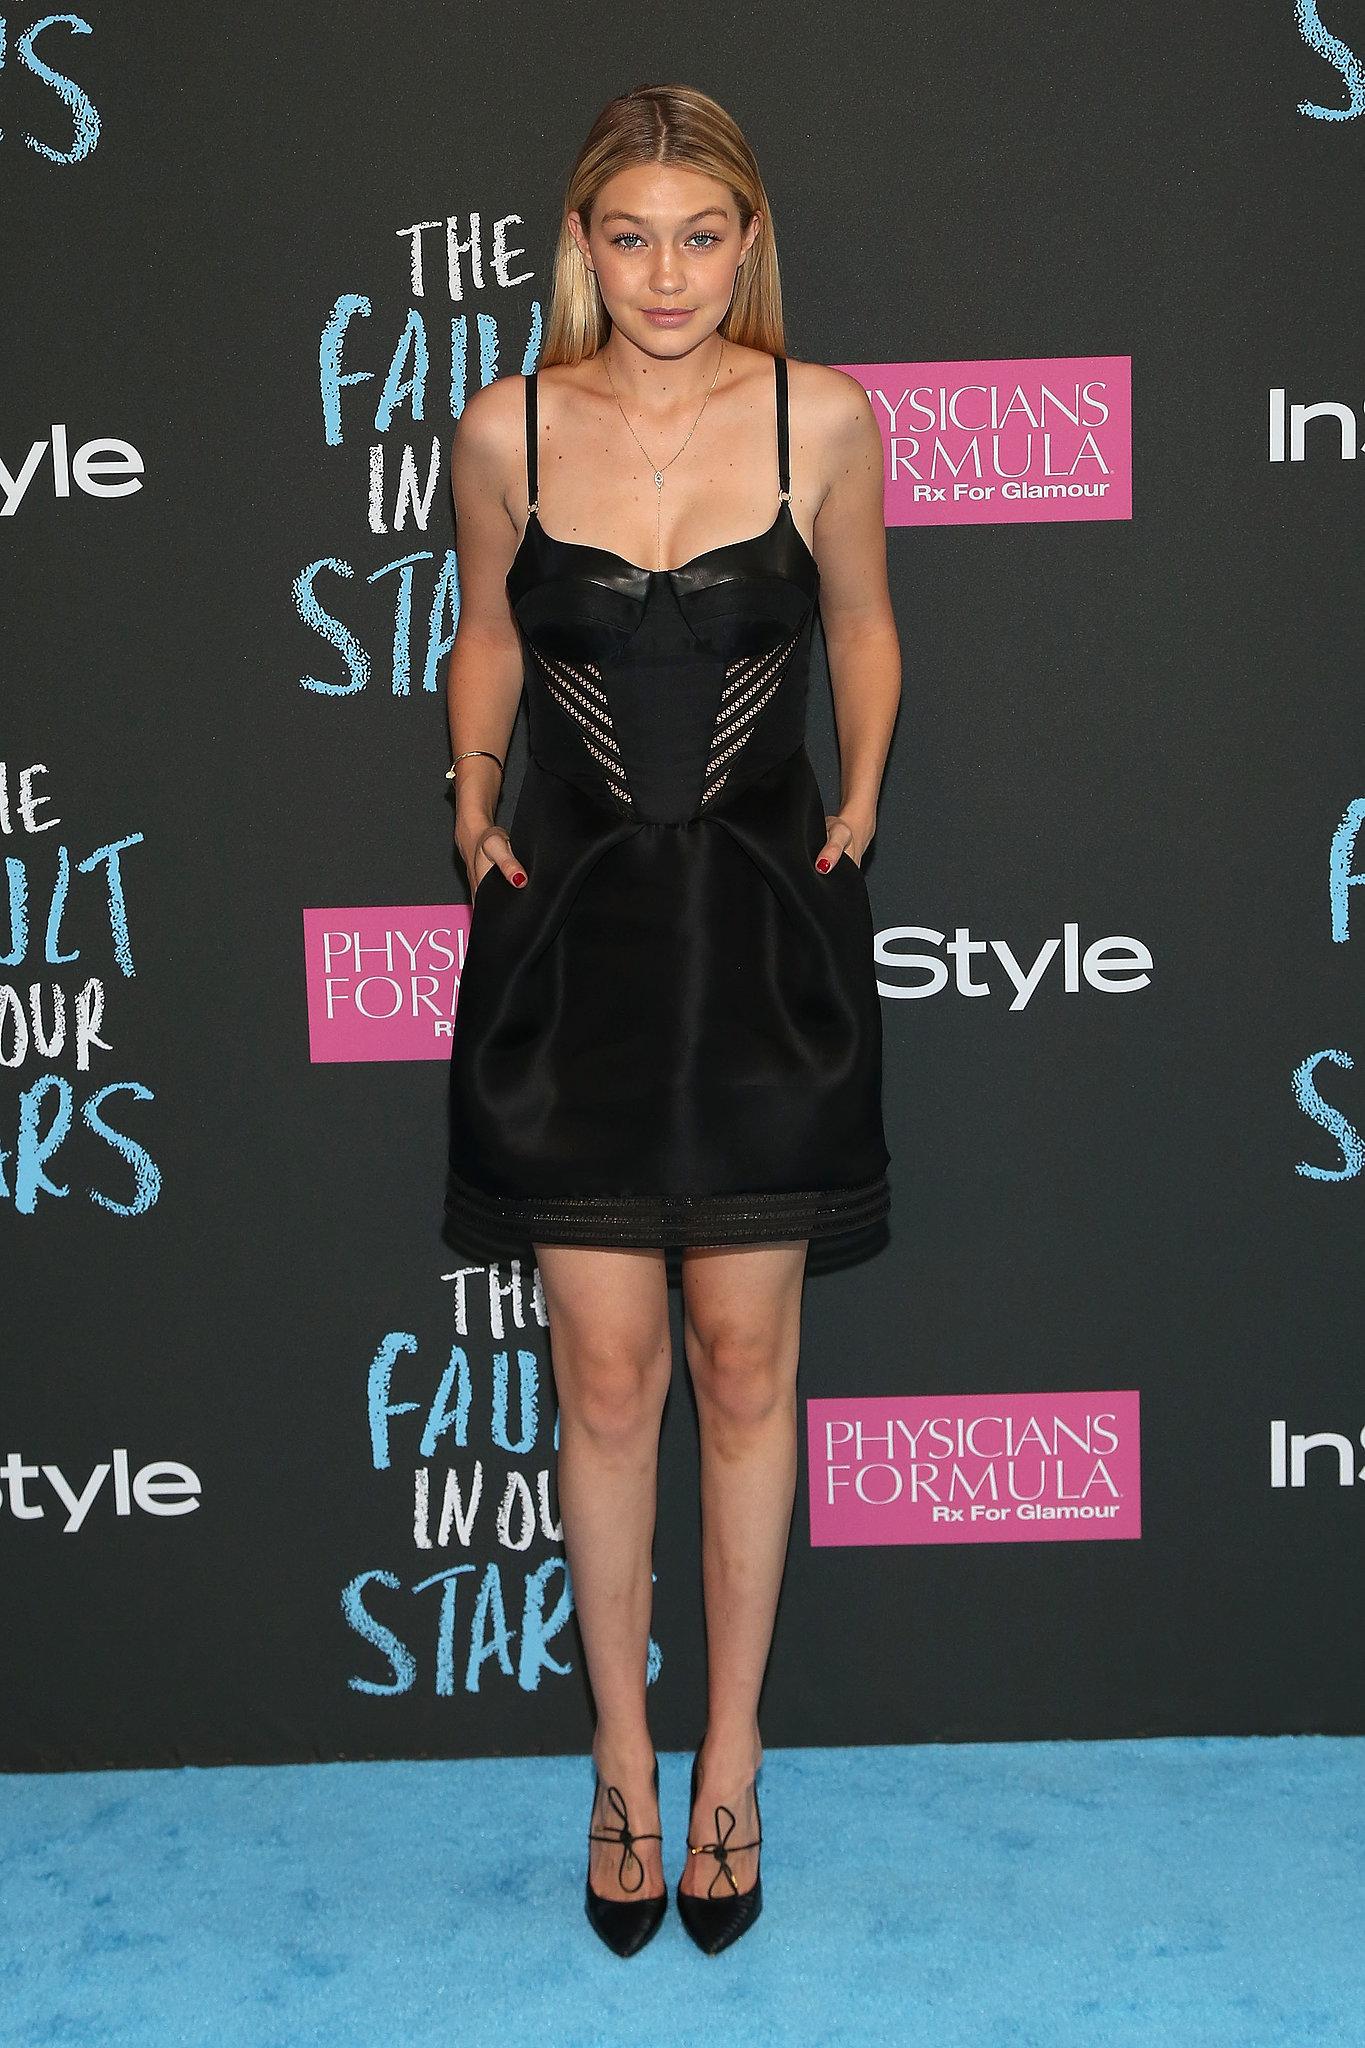 Model Gigi Hadid made an appearance.